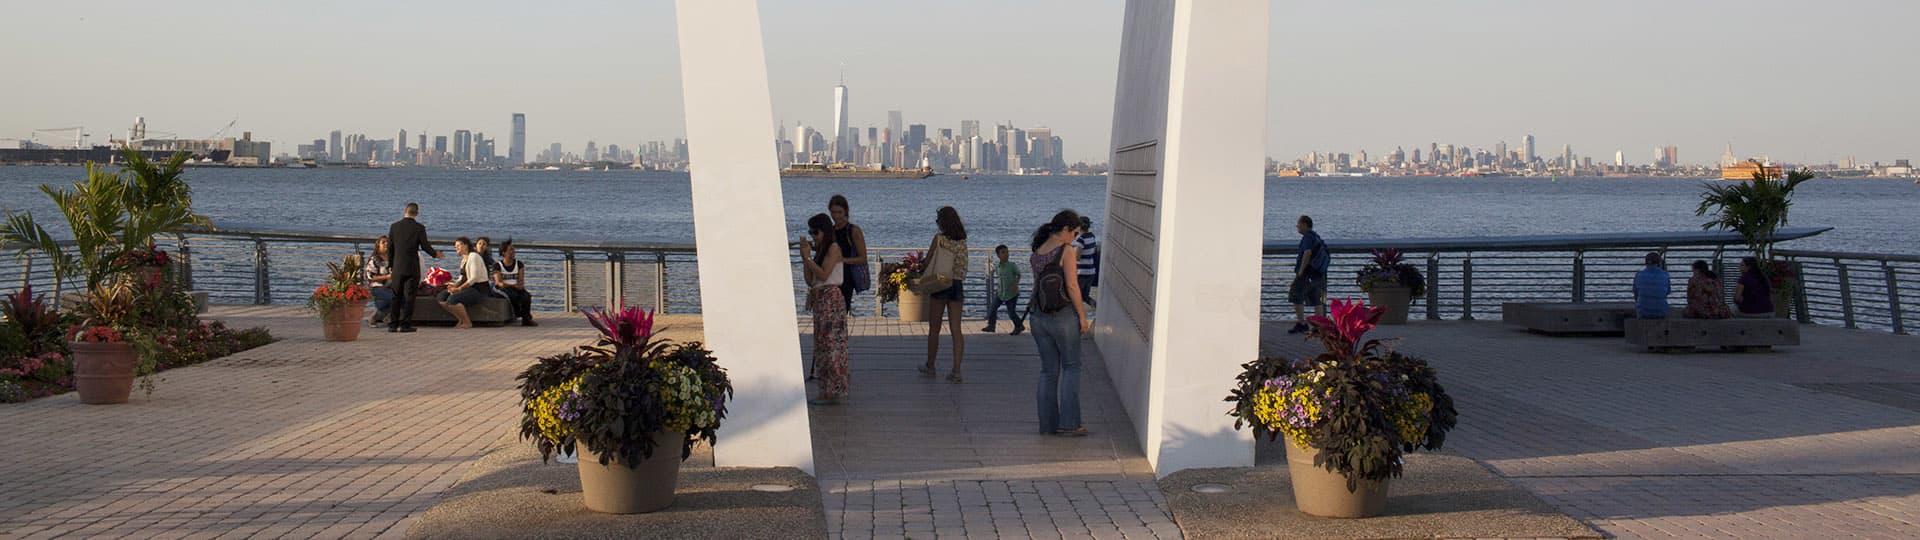 Staten Island September 11 Memorial, Staten Island, St George,